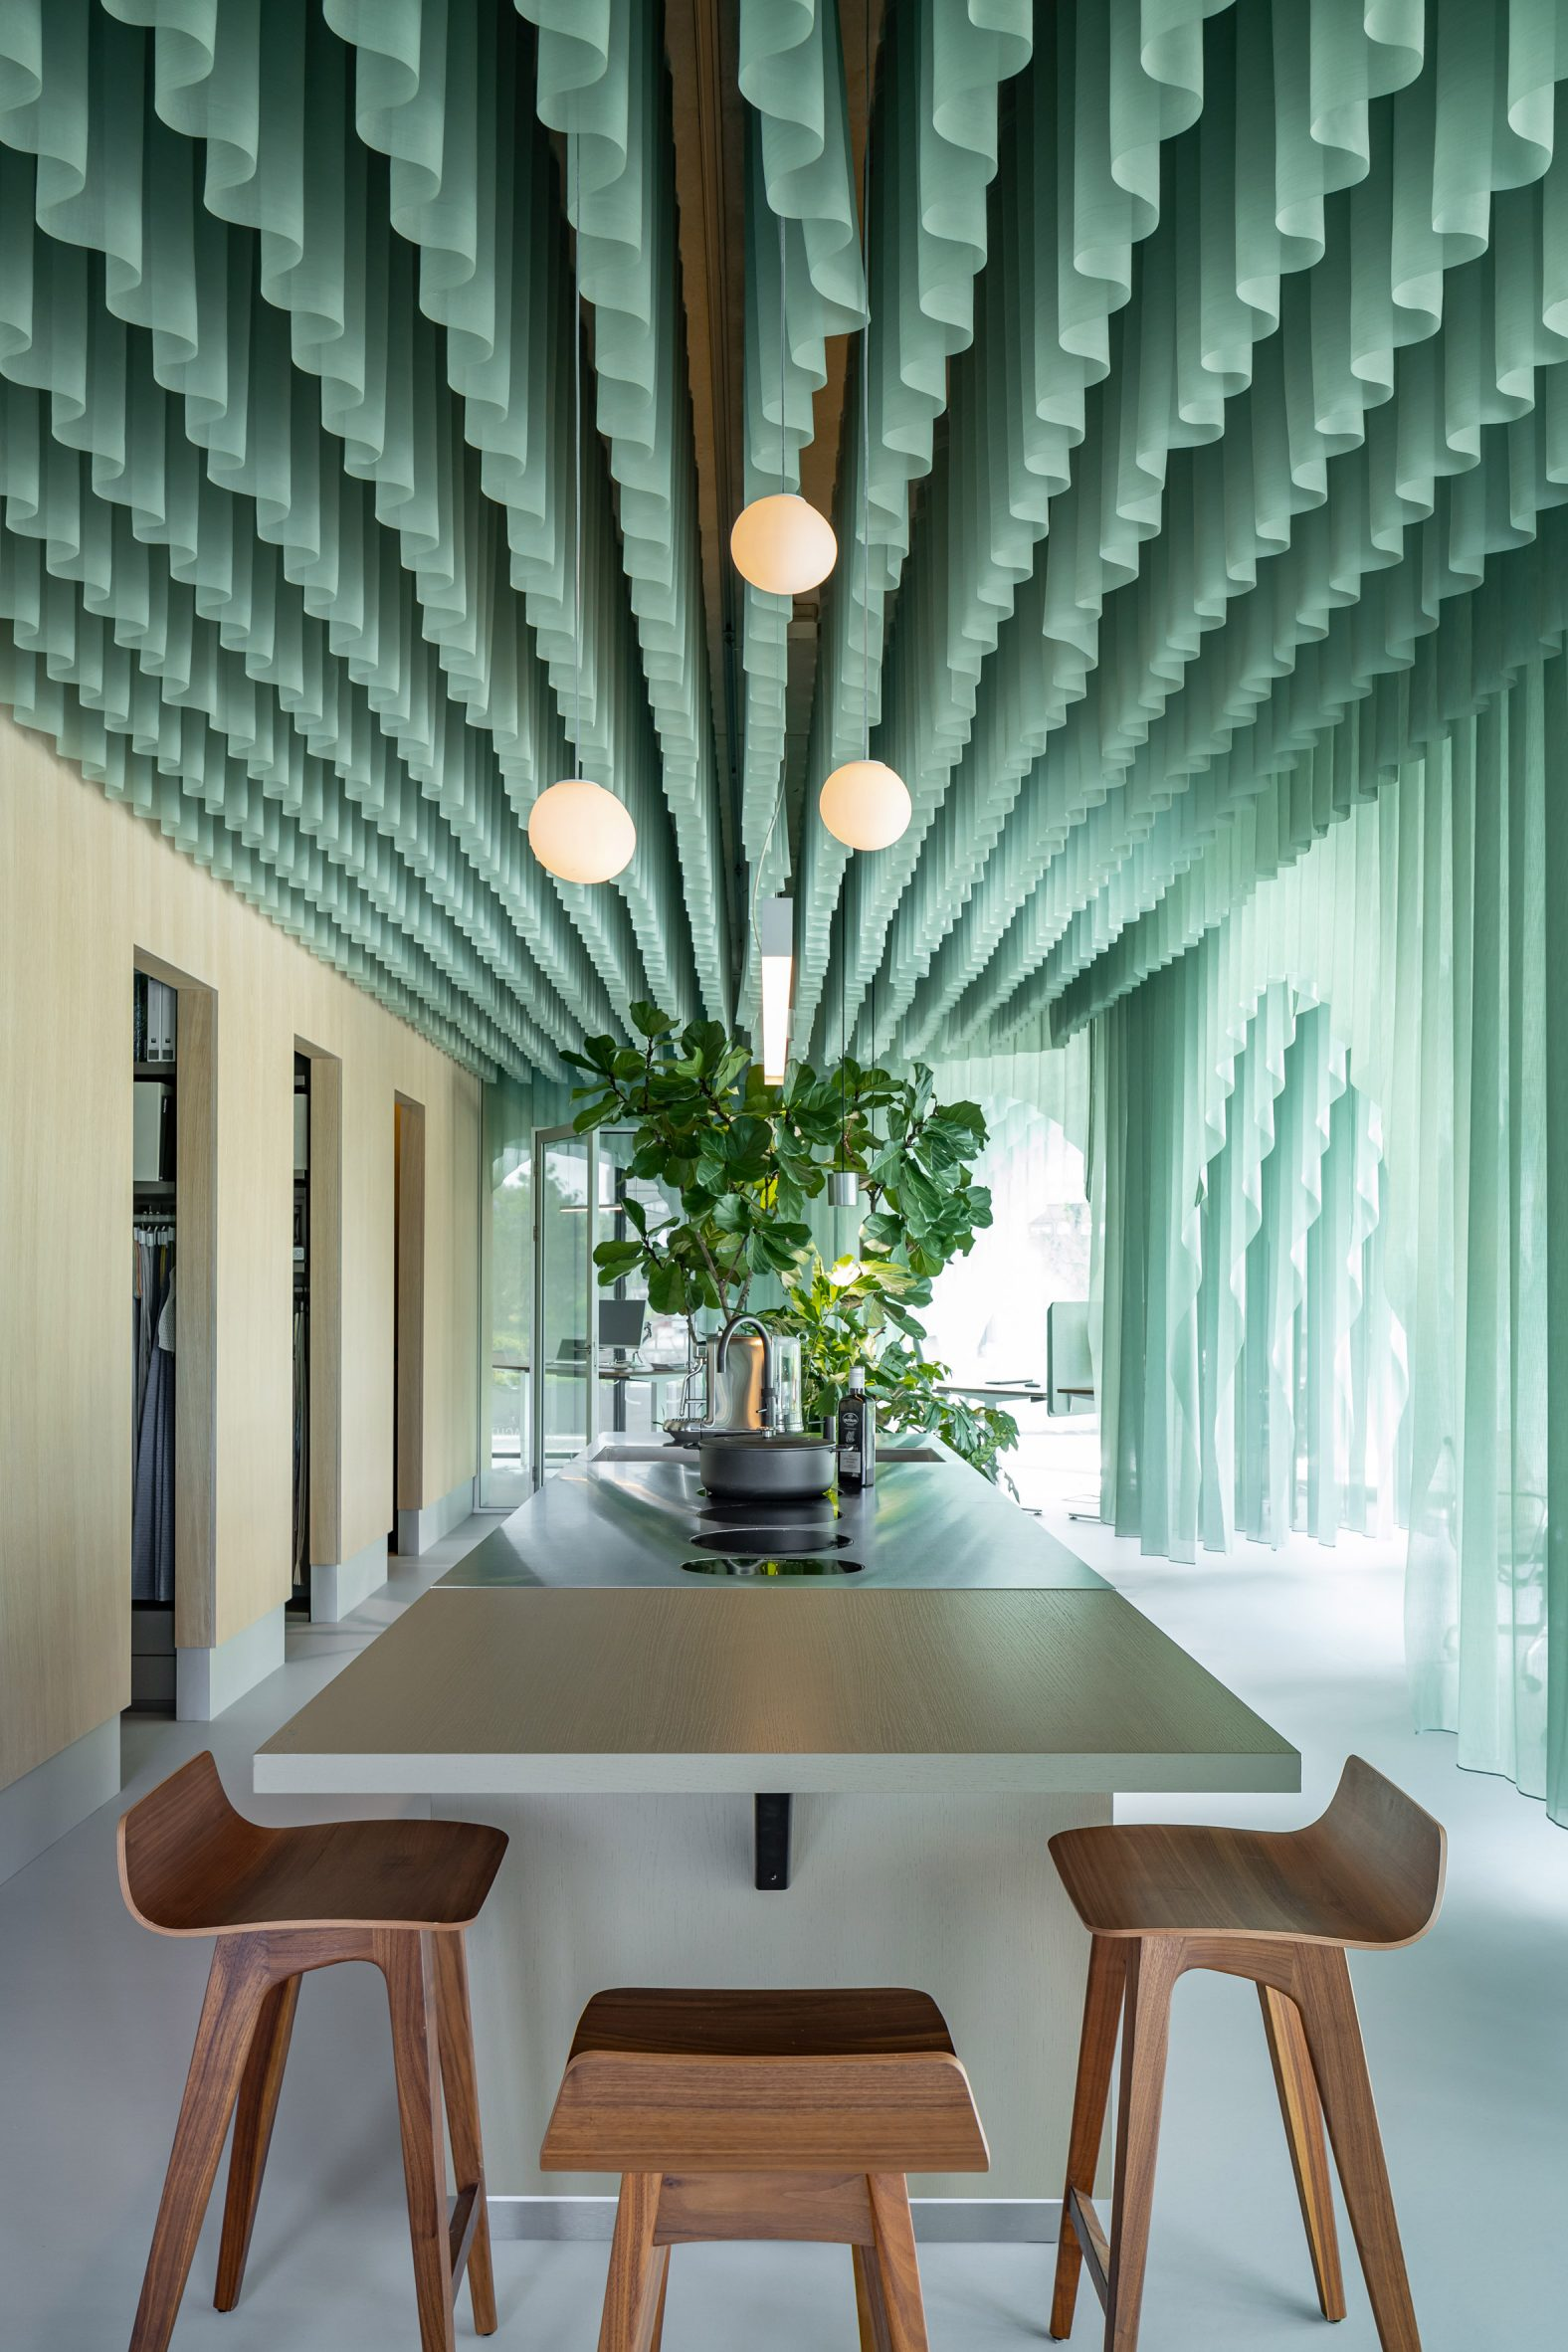 The kitchen at siersema office has an open plan design